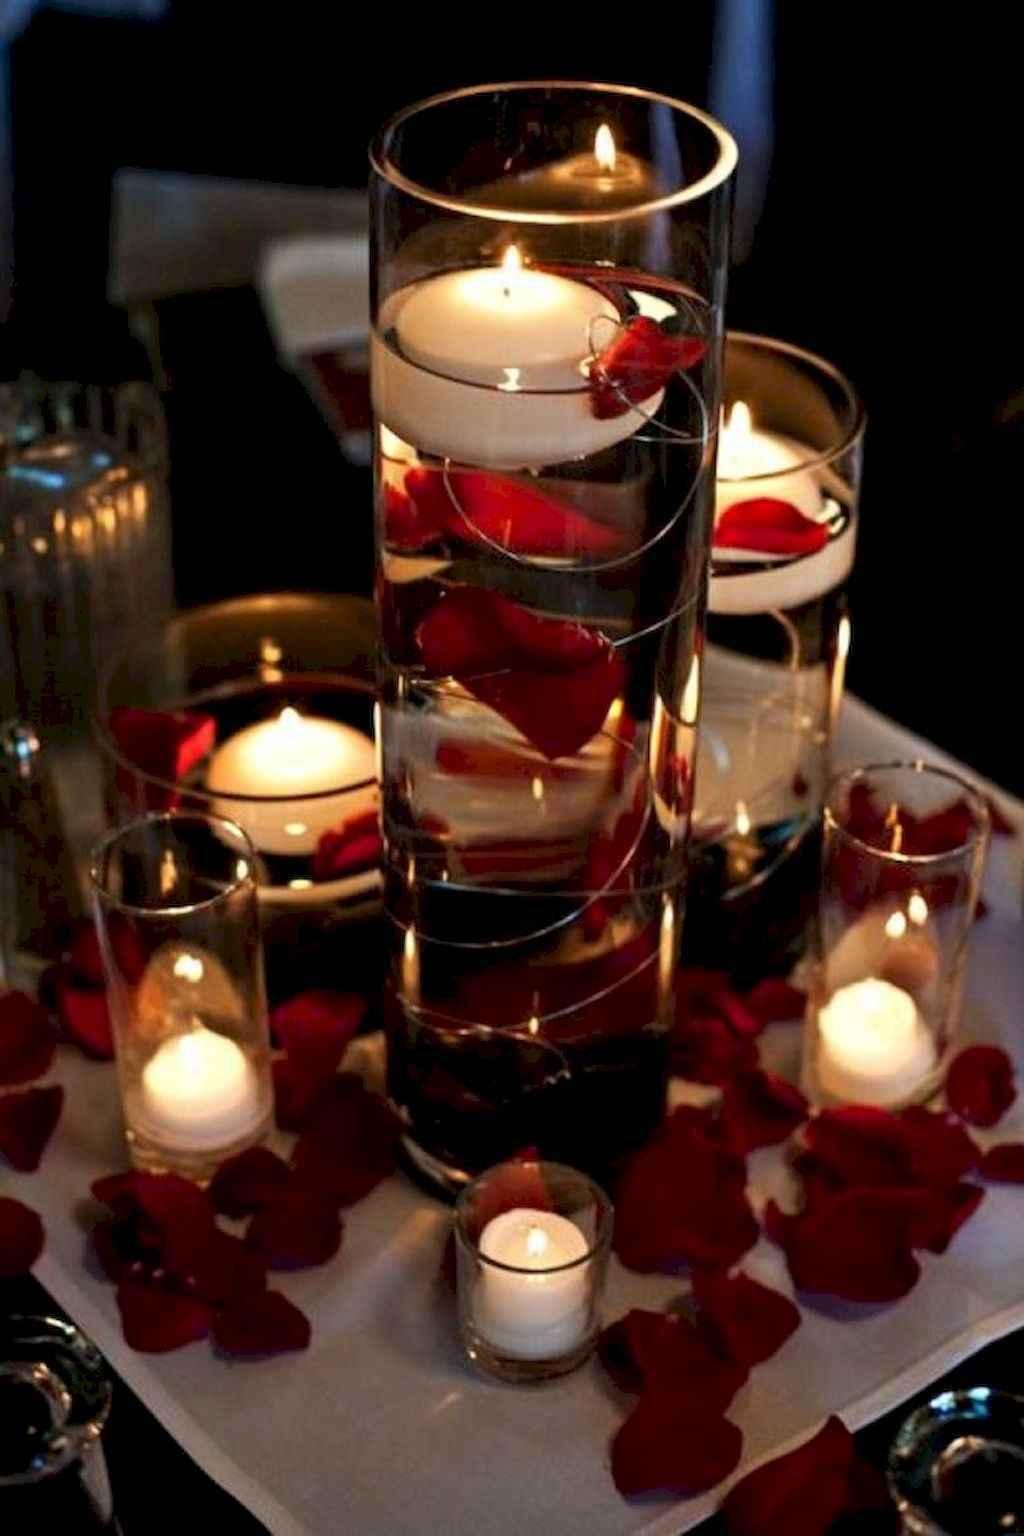 66 Romantic Valentines Table Settings Decor Ideas (5)